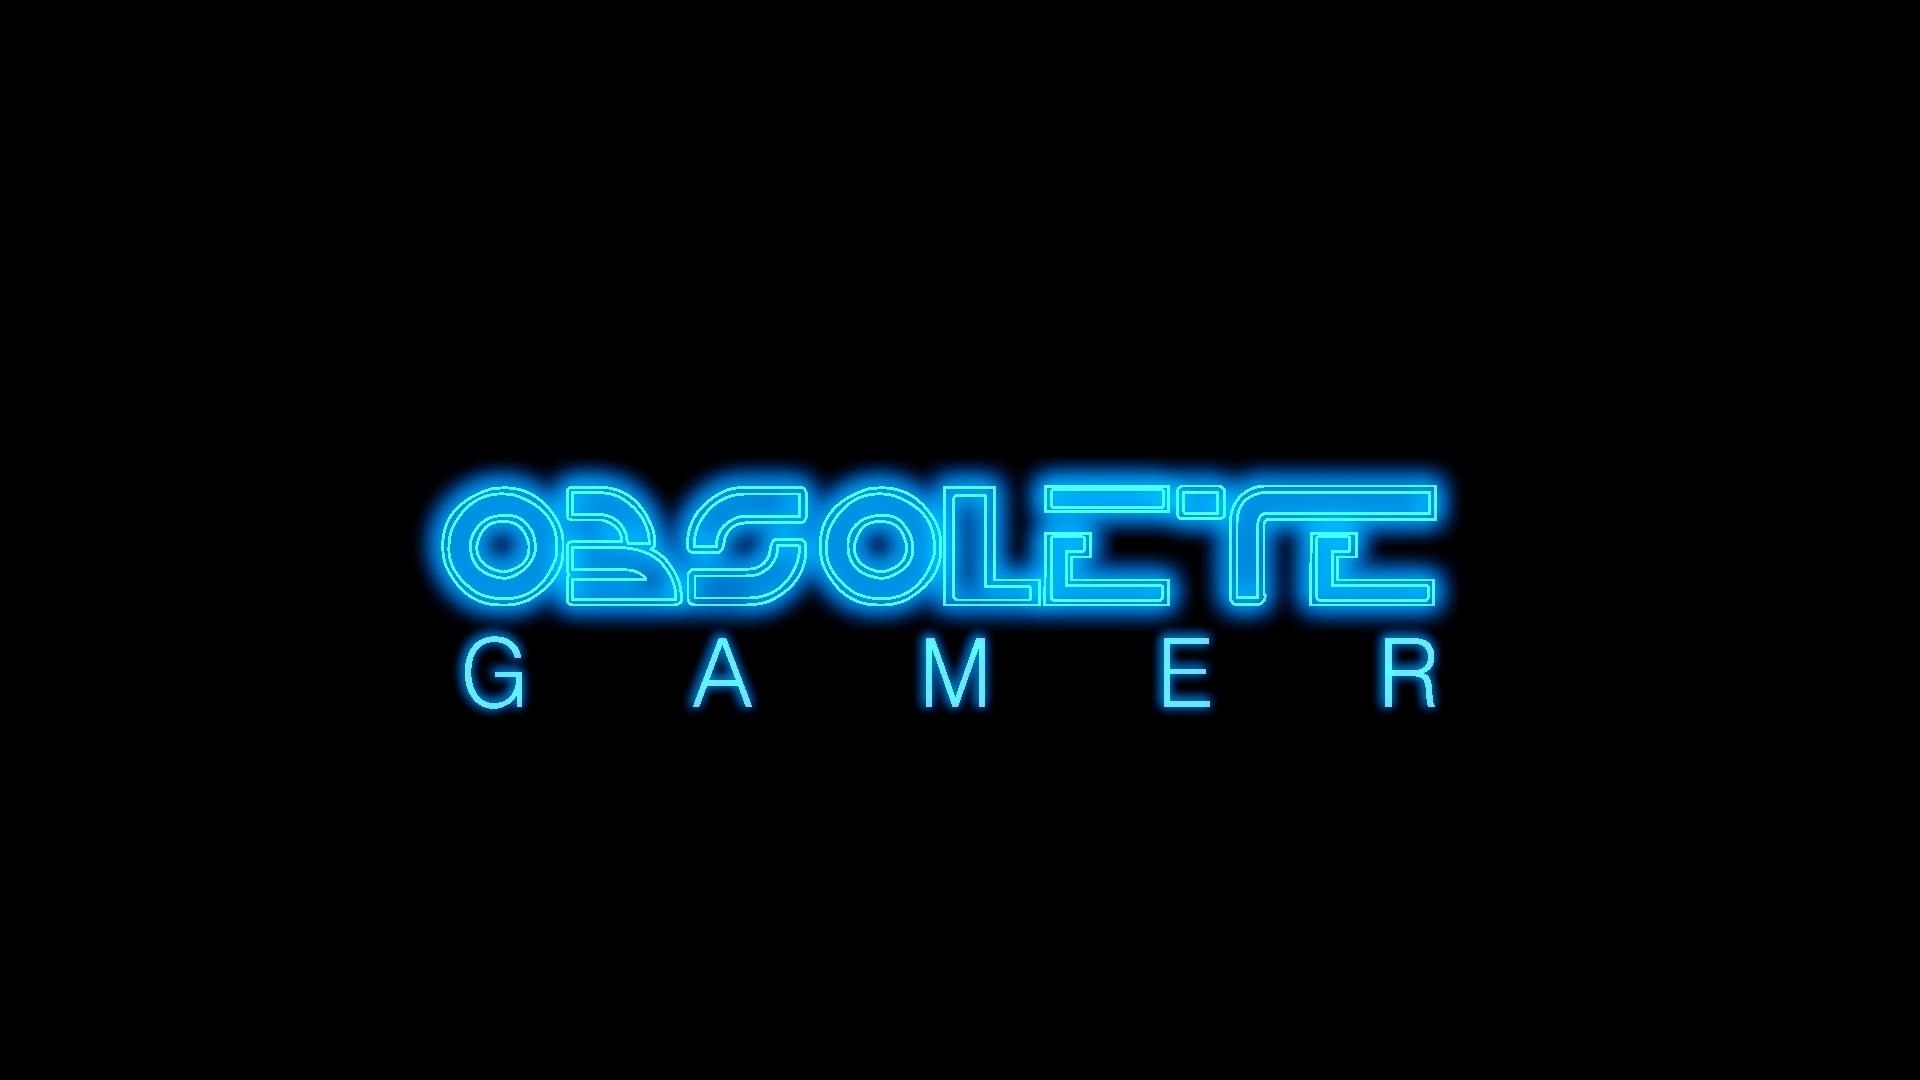 obsolete gamer logo